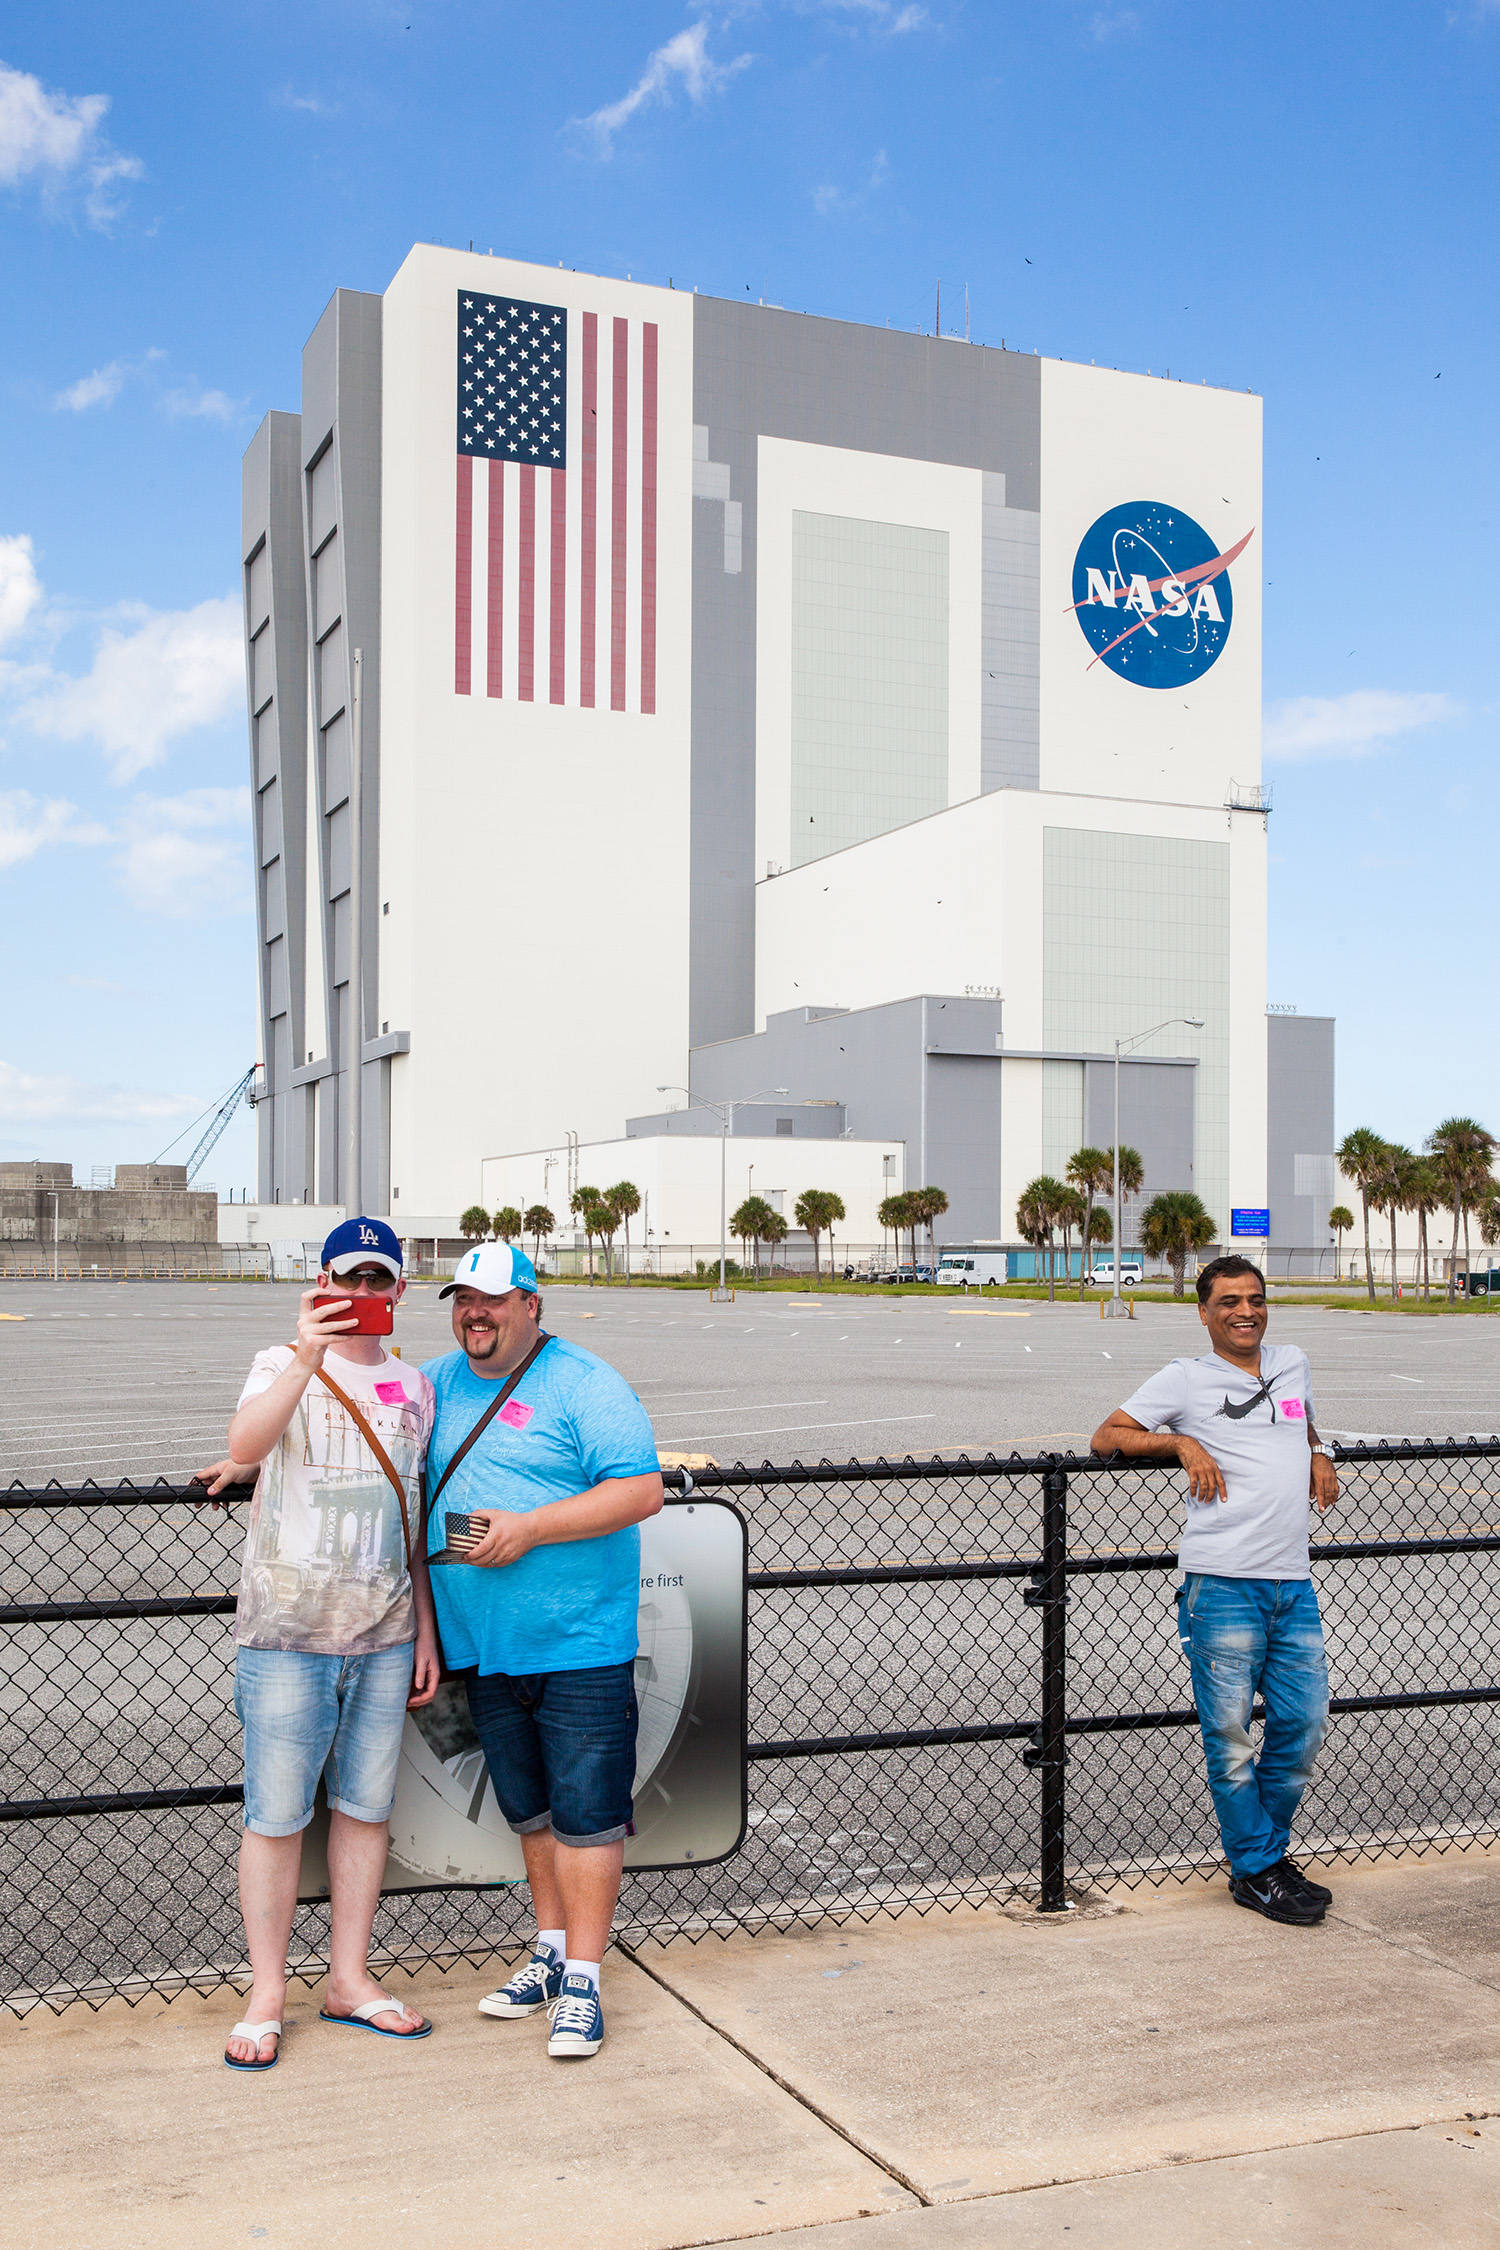 NASA building travel photography